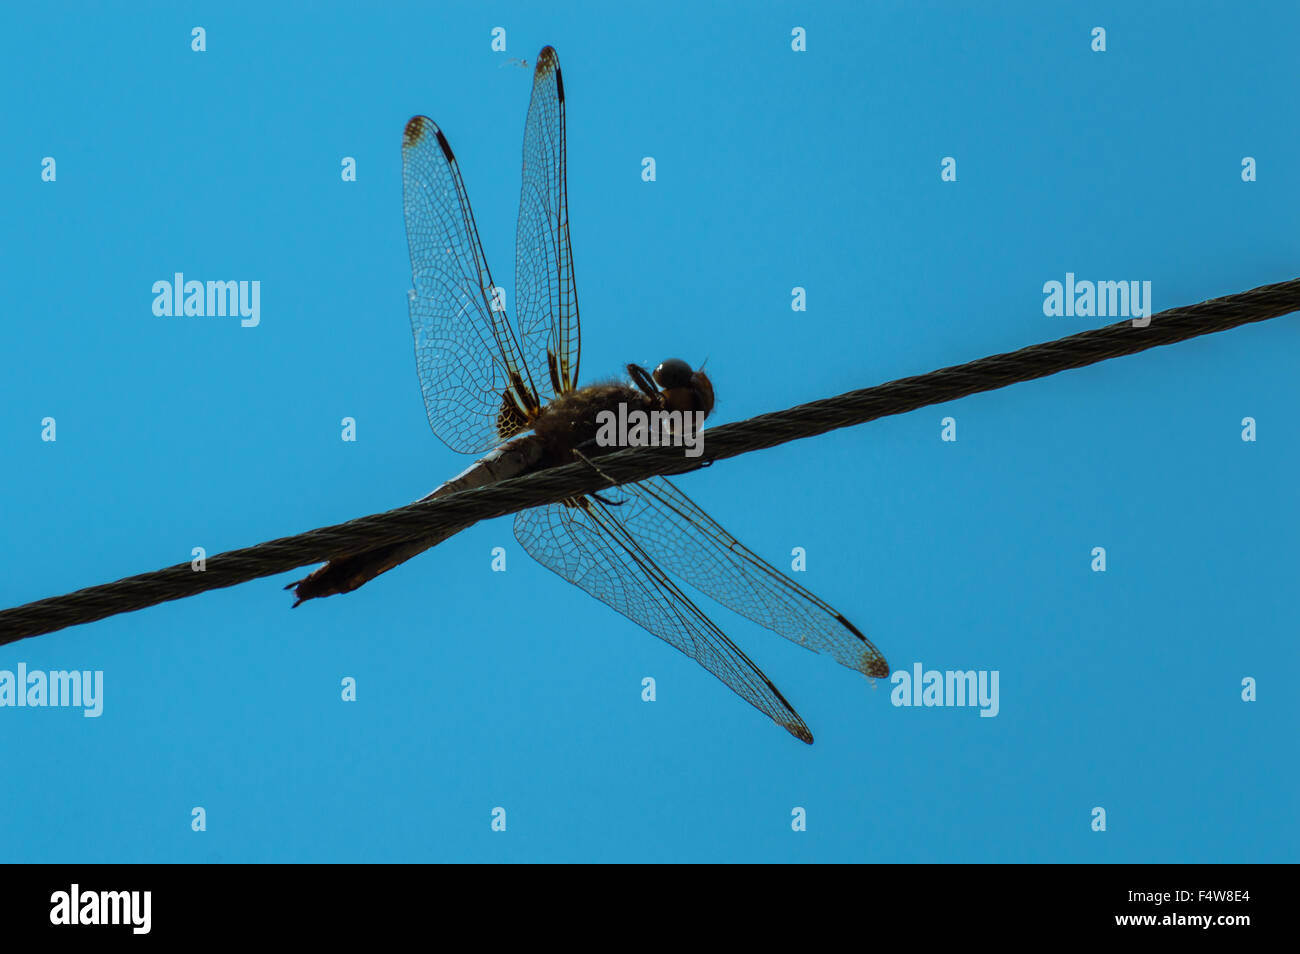 Iron Wire Stock Photos & Iron Wire Stock Images - Alamy